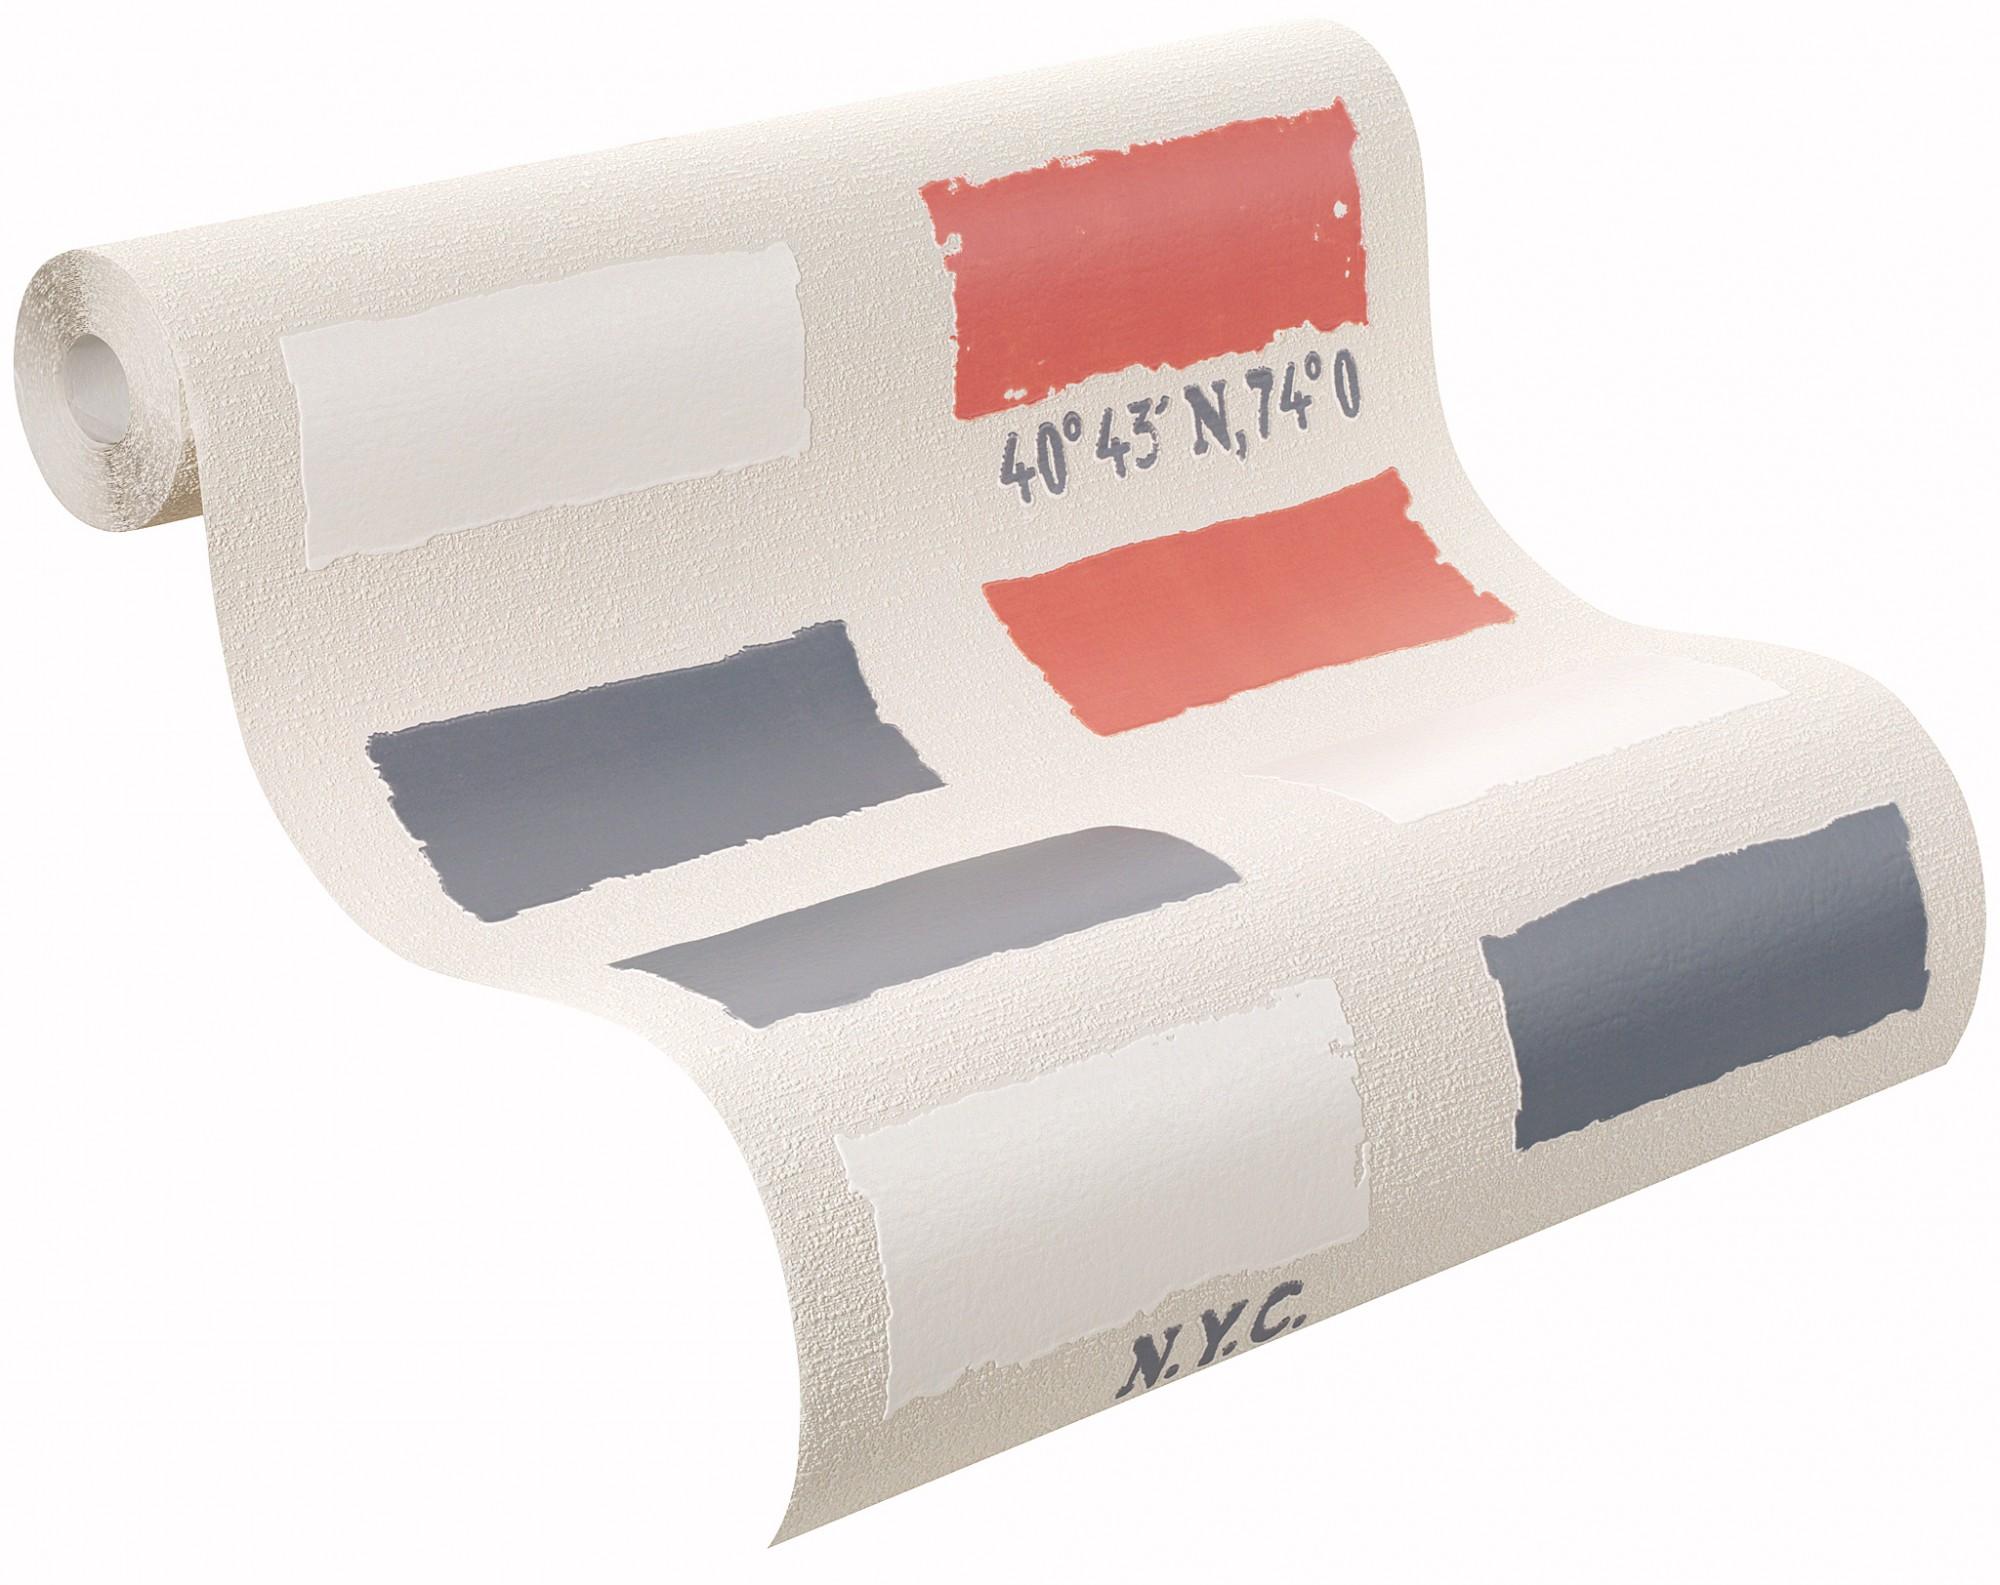 vliestapete beige rot wei grau muster rasch home vision 4 eastcoast tapete 4269 ebay. Black Bedroom Furniture Sets. Home Design Ideas